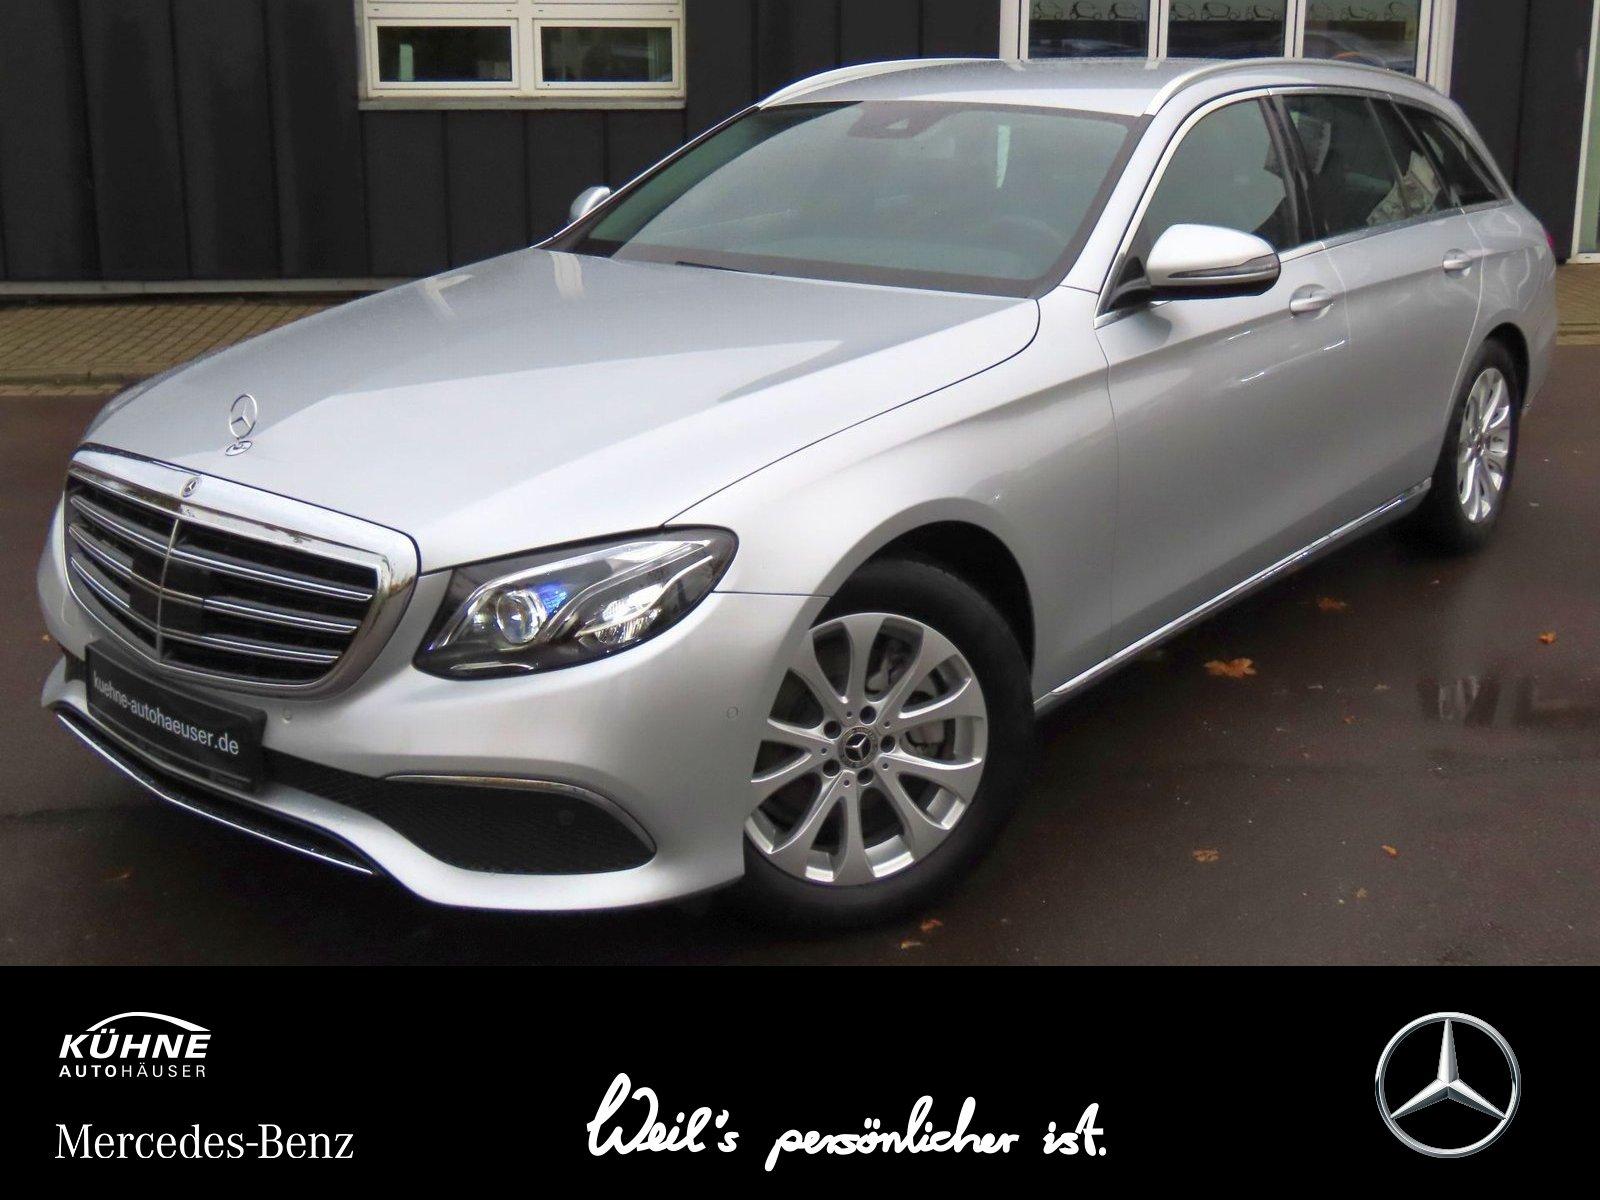 Mercedes-Benz E 200 d T d Exclusive+Distronic+Kamera+Multibeam, Jahr 2019, Diesel